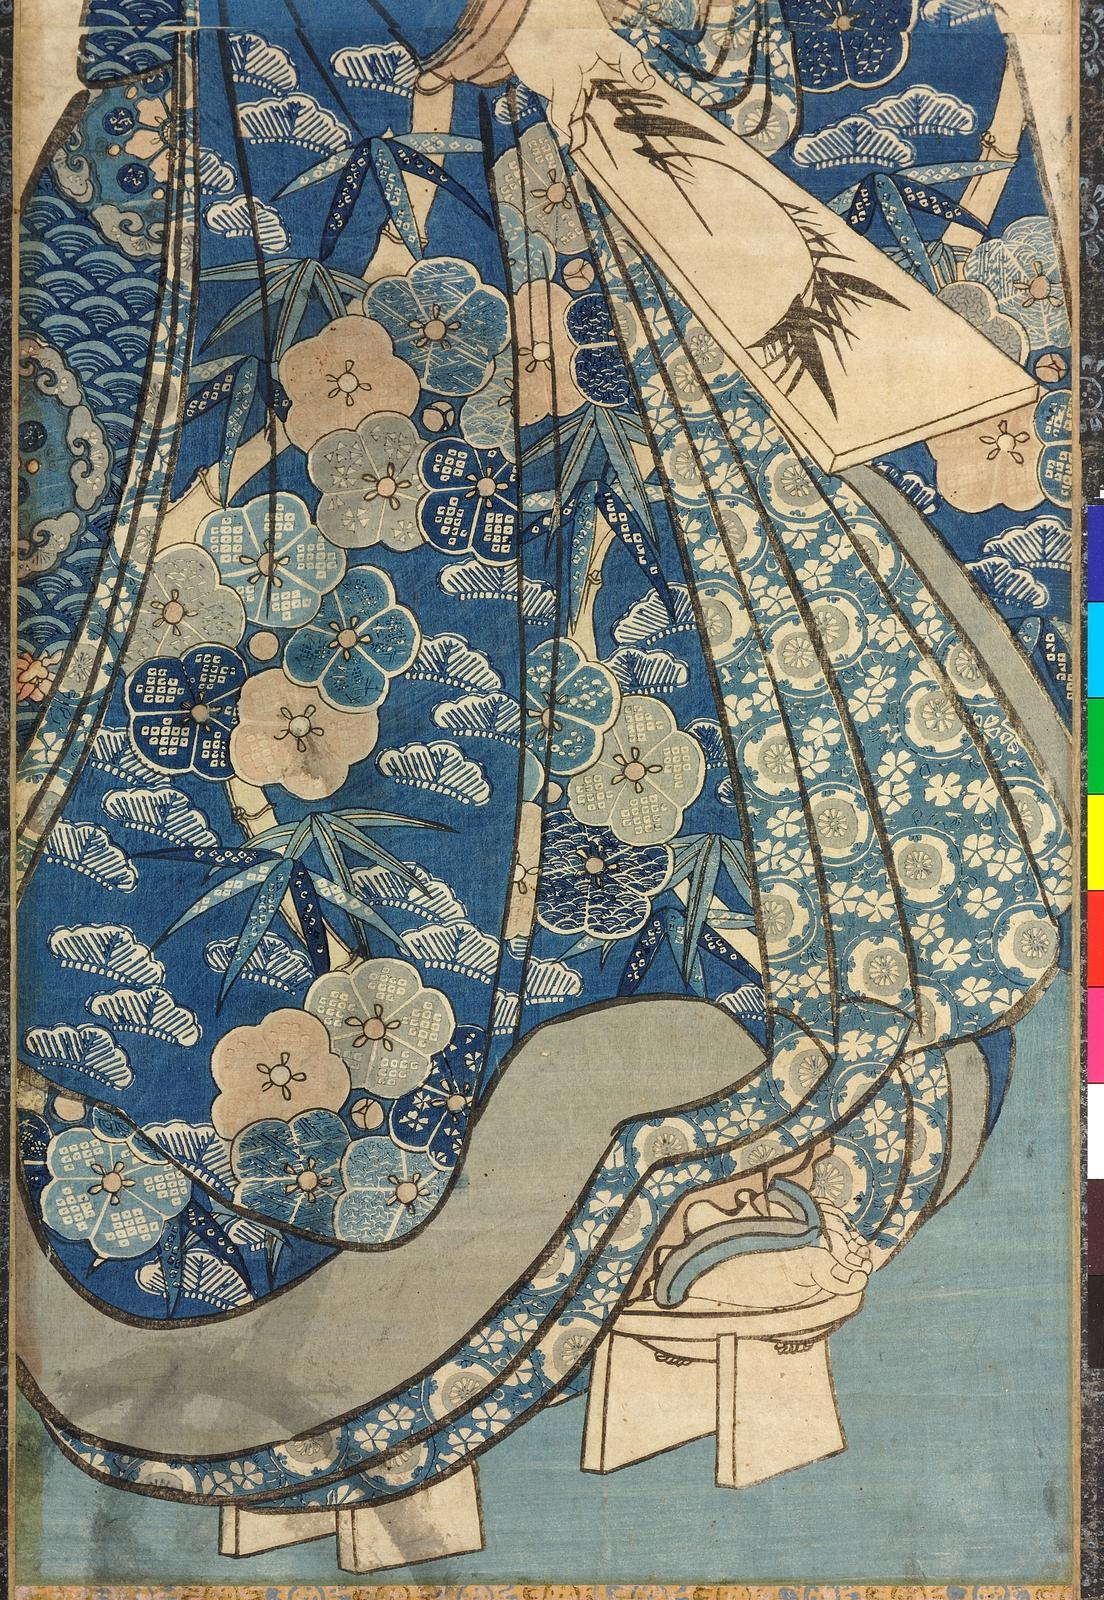 File:Diptych print (BM 2008,3037.18207).jpg - Wikimedia